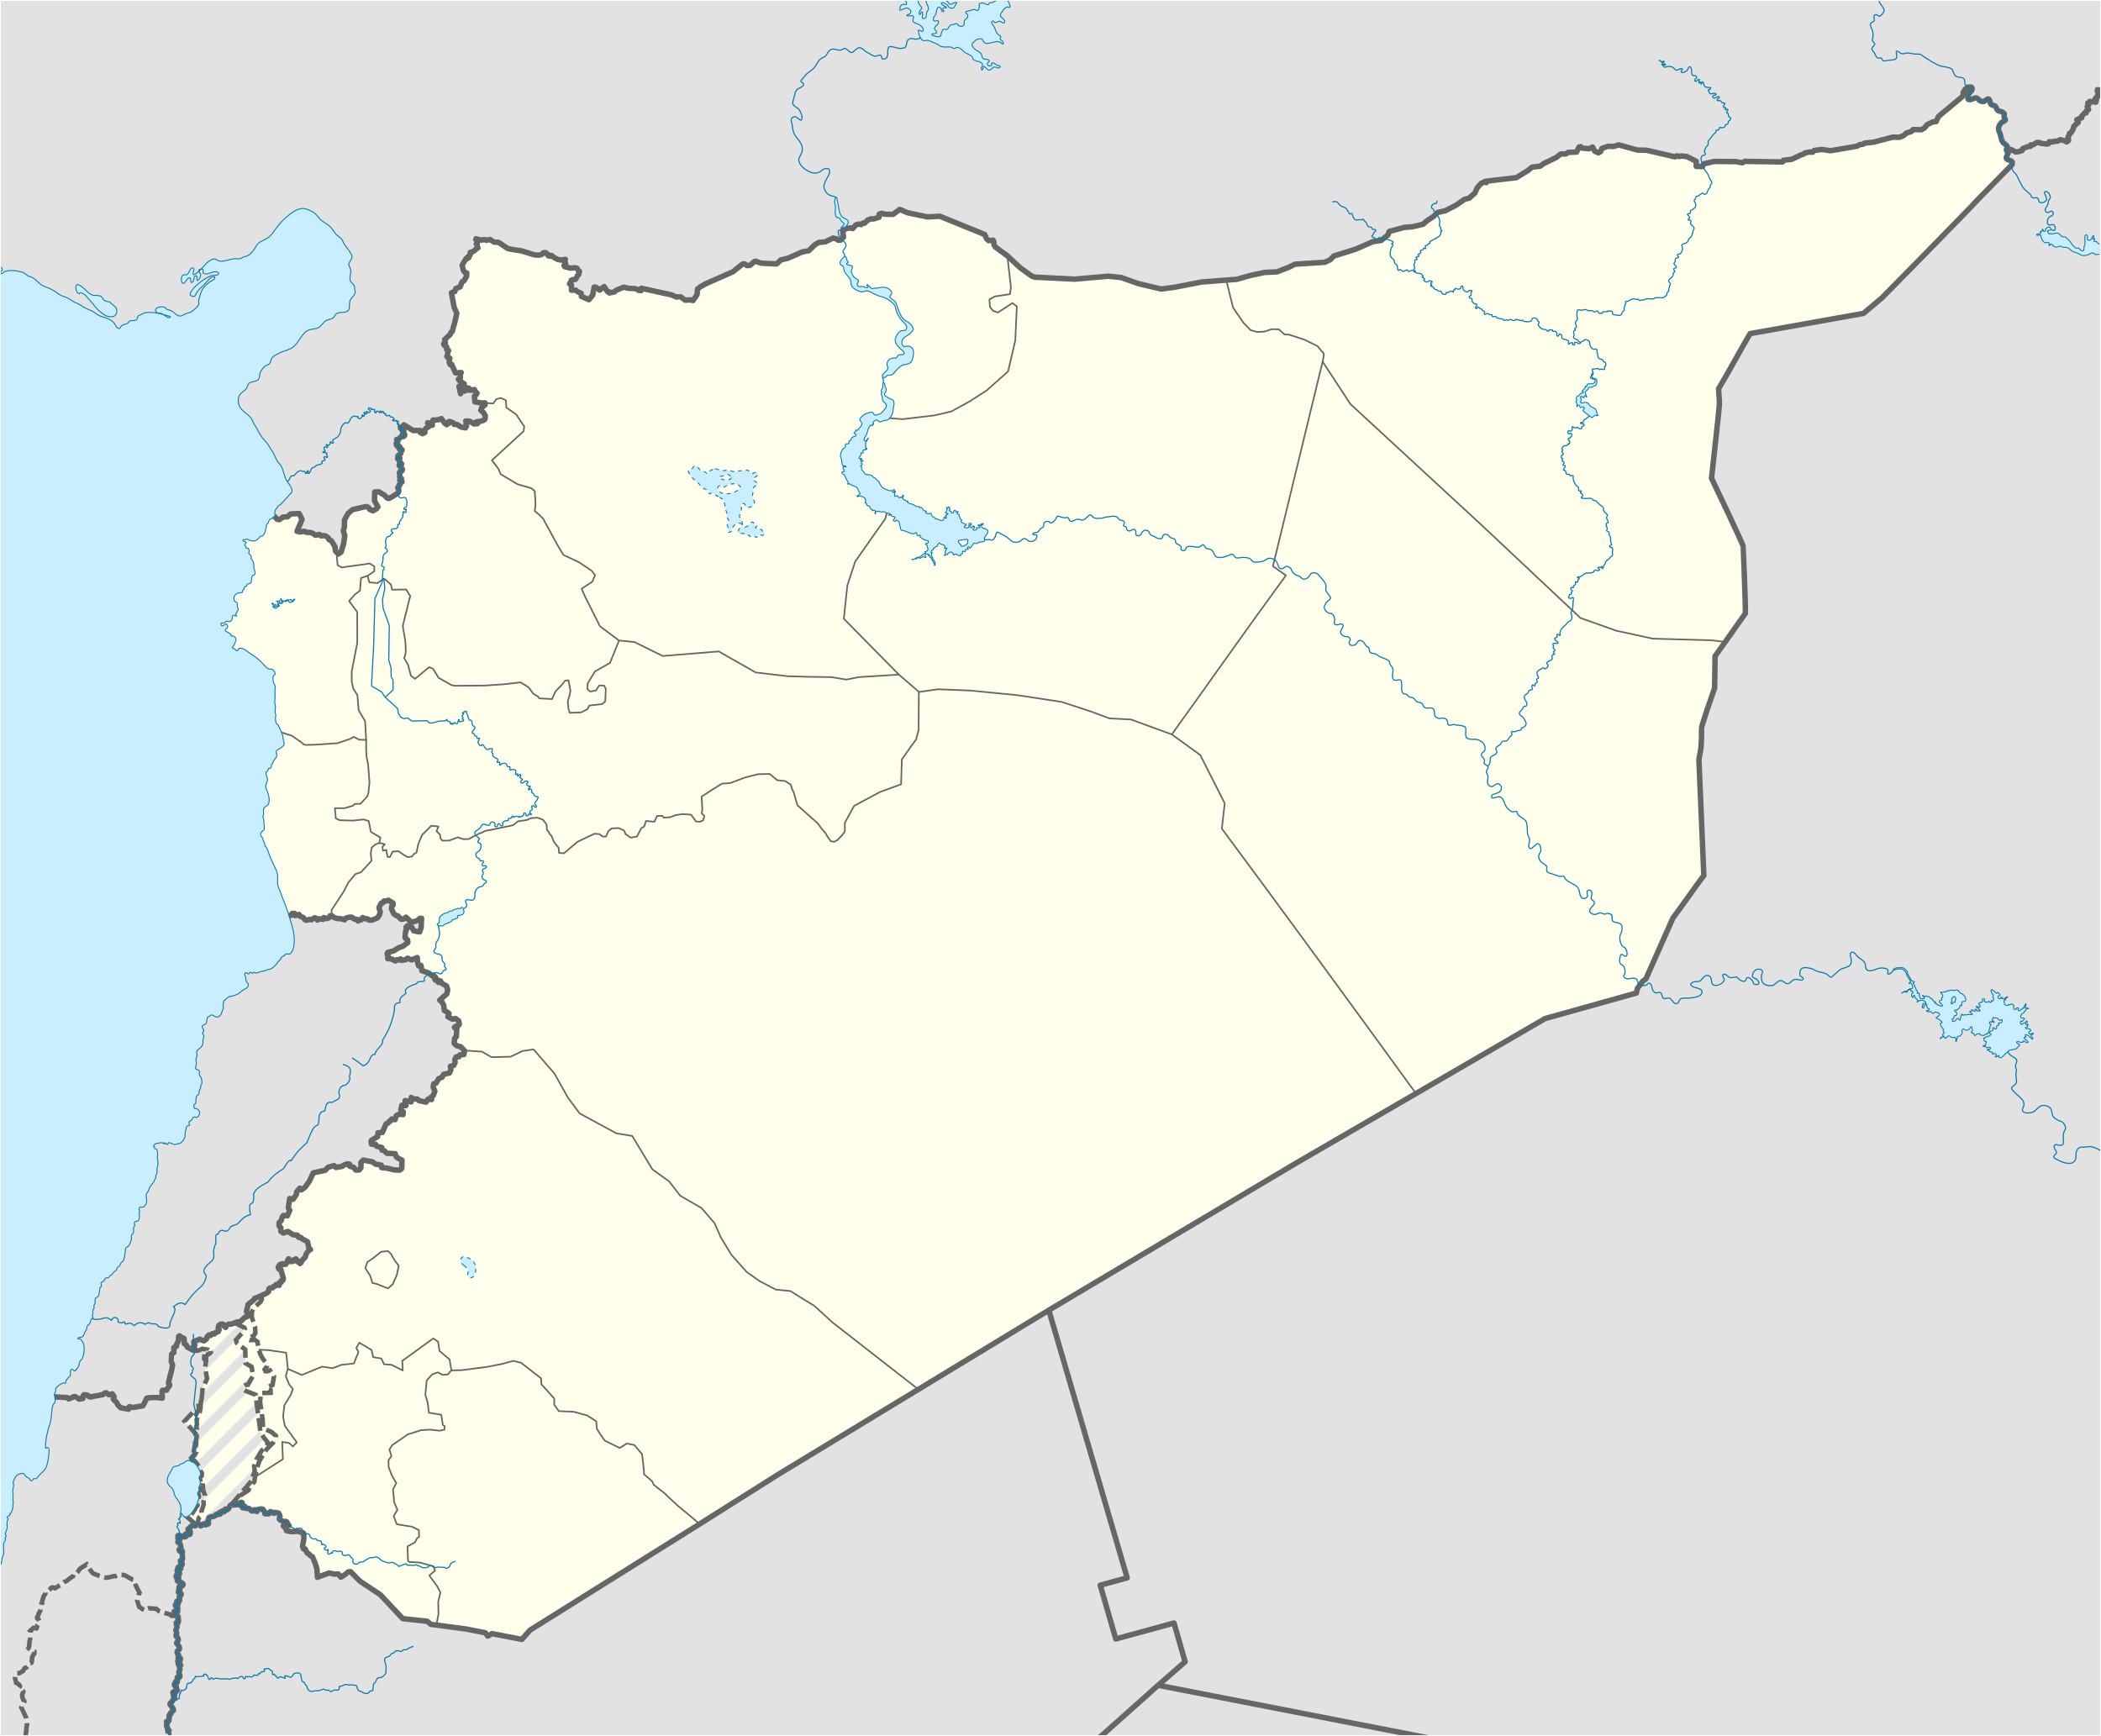 template syrian civil war detailed map qsrc 3044